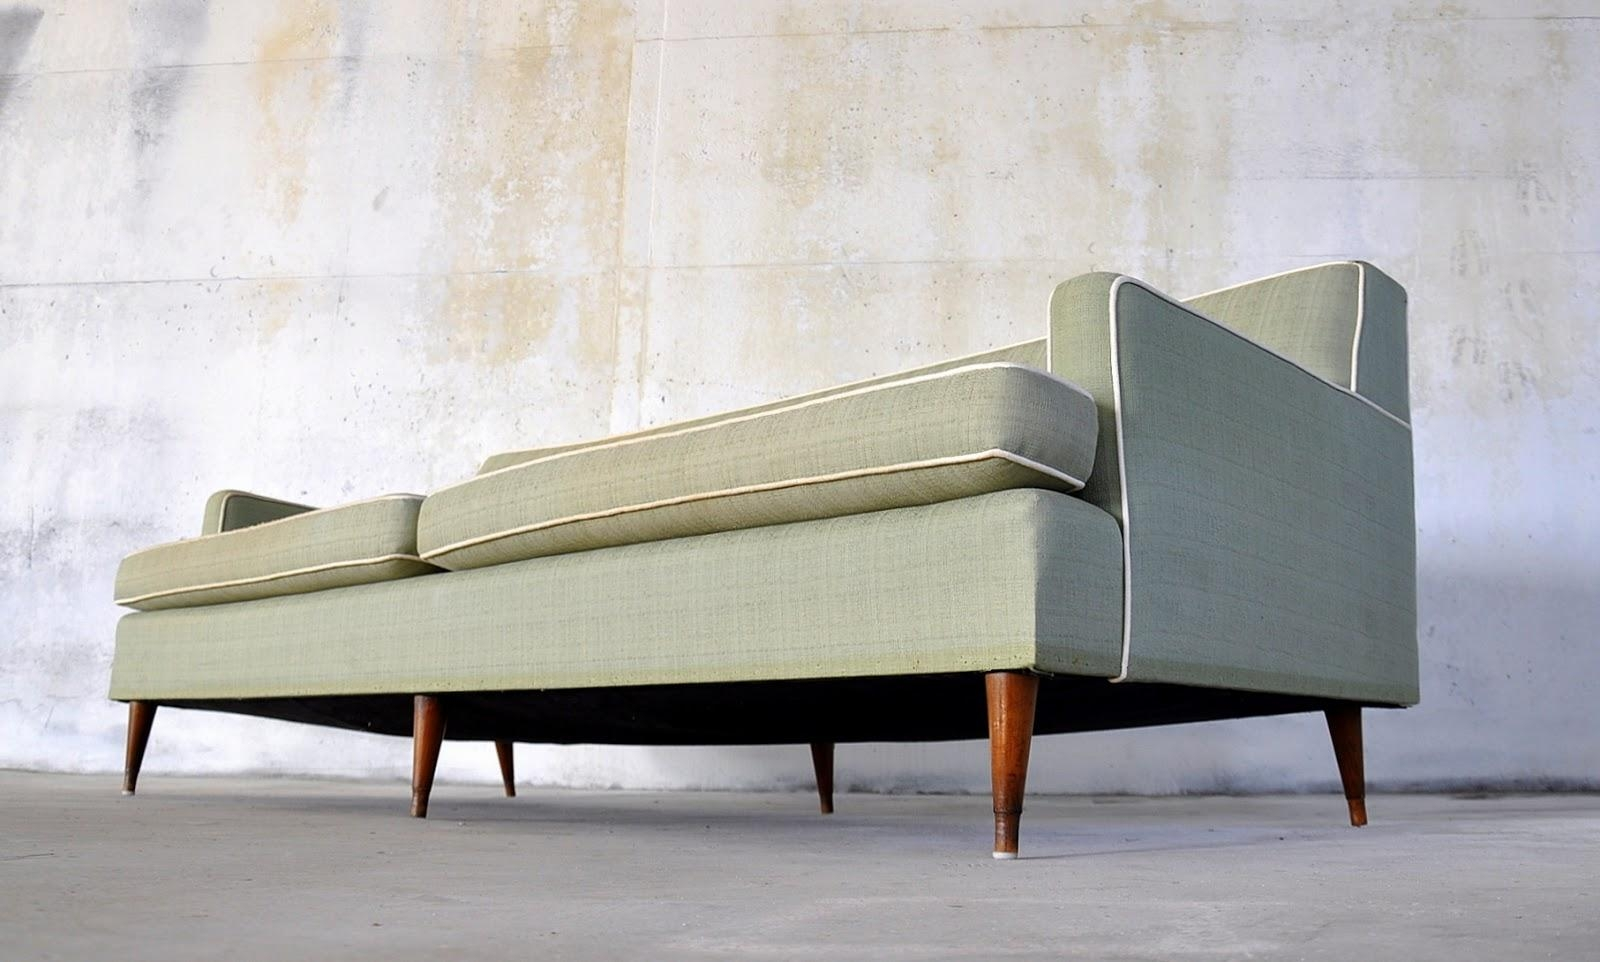 Bedroom Furniture : Danish Modern Furniture Sofa Expansive Dark With Danish Modern Sofas (Image 1 of 20)